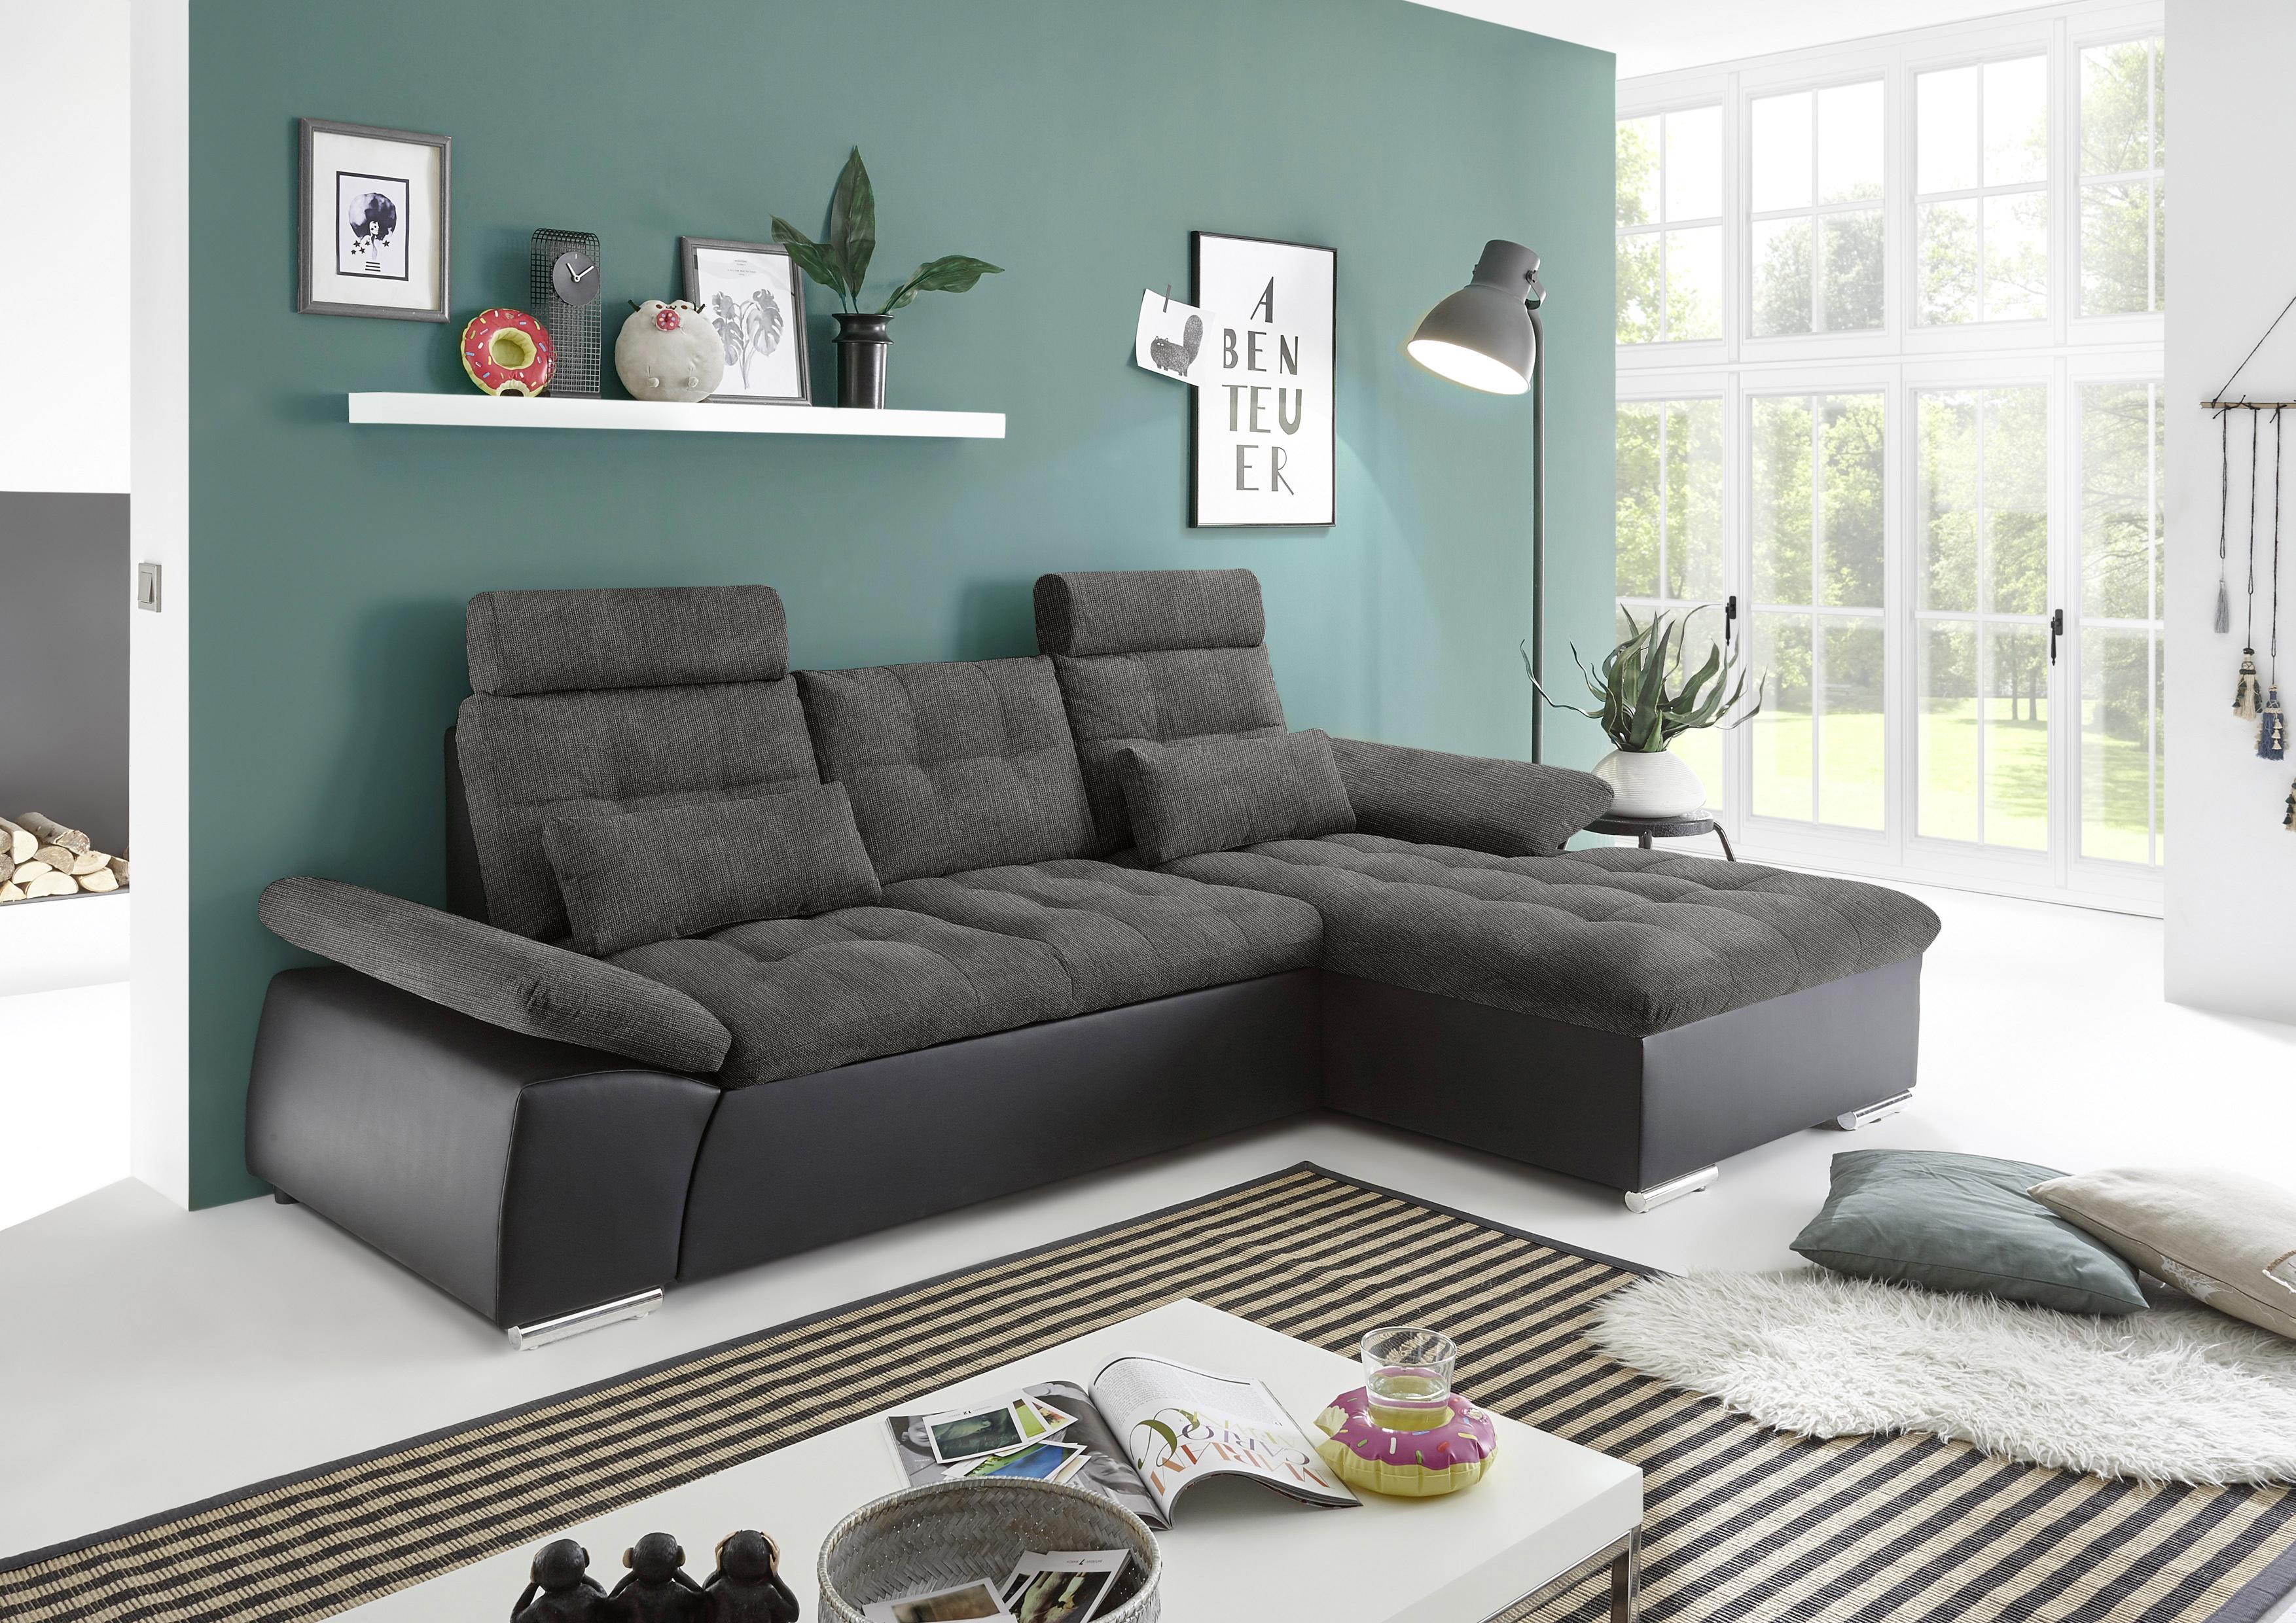 ecksofa couch schlafcouch schlafsofa lederlook schwarz. Black Bedroom Furniture Sets. Home Design Ideas